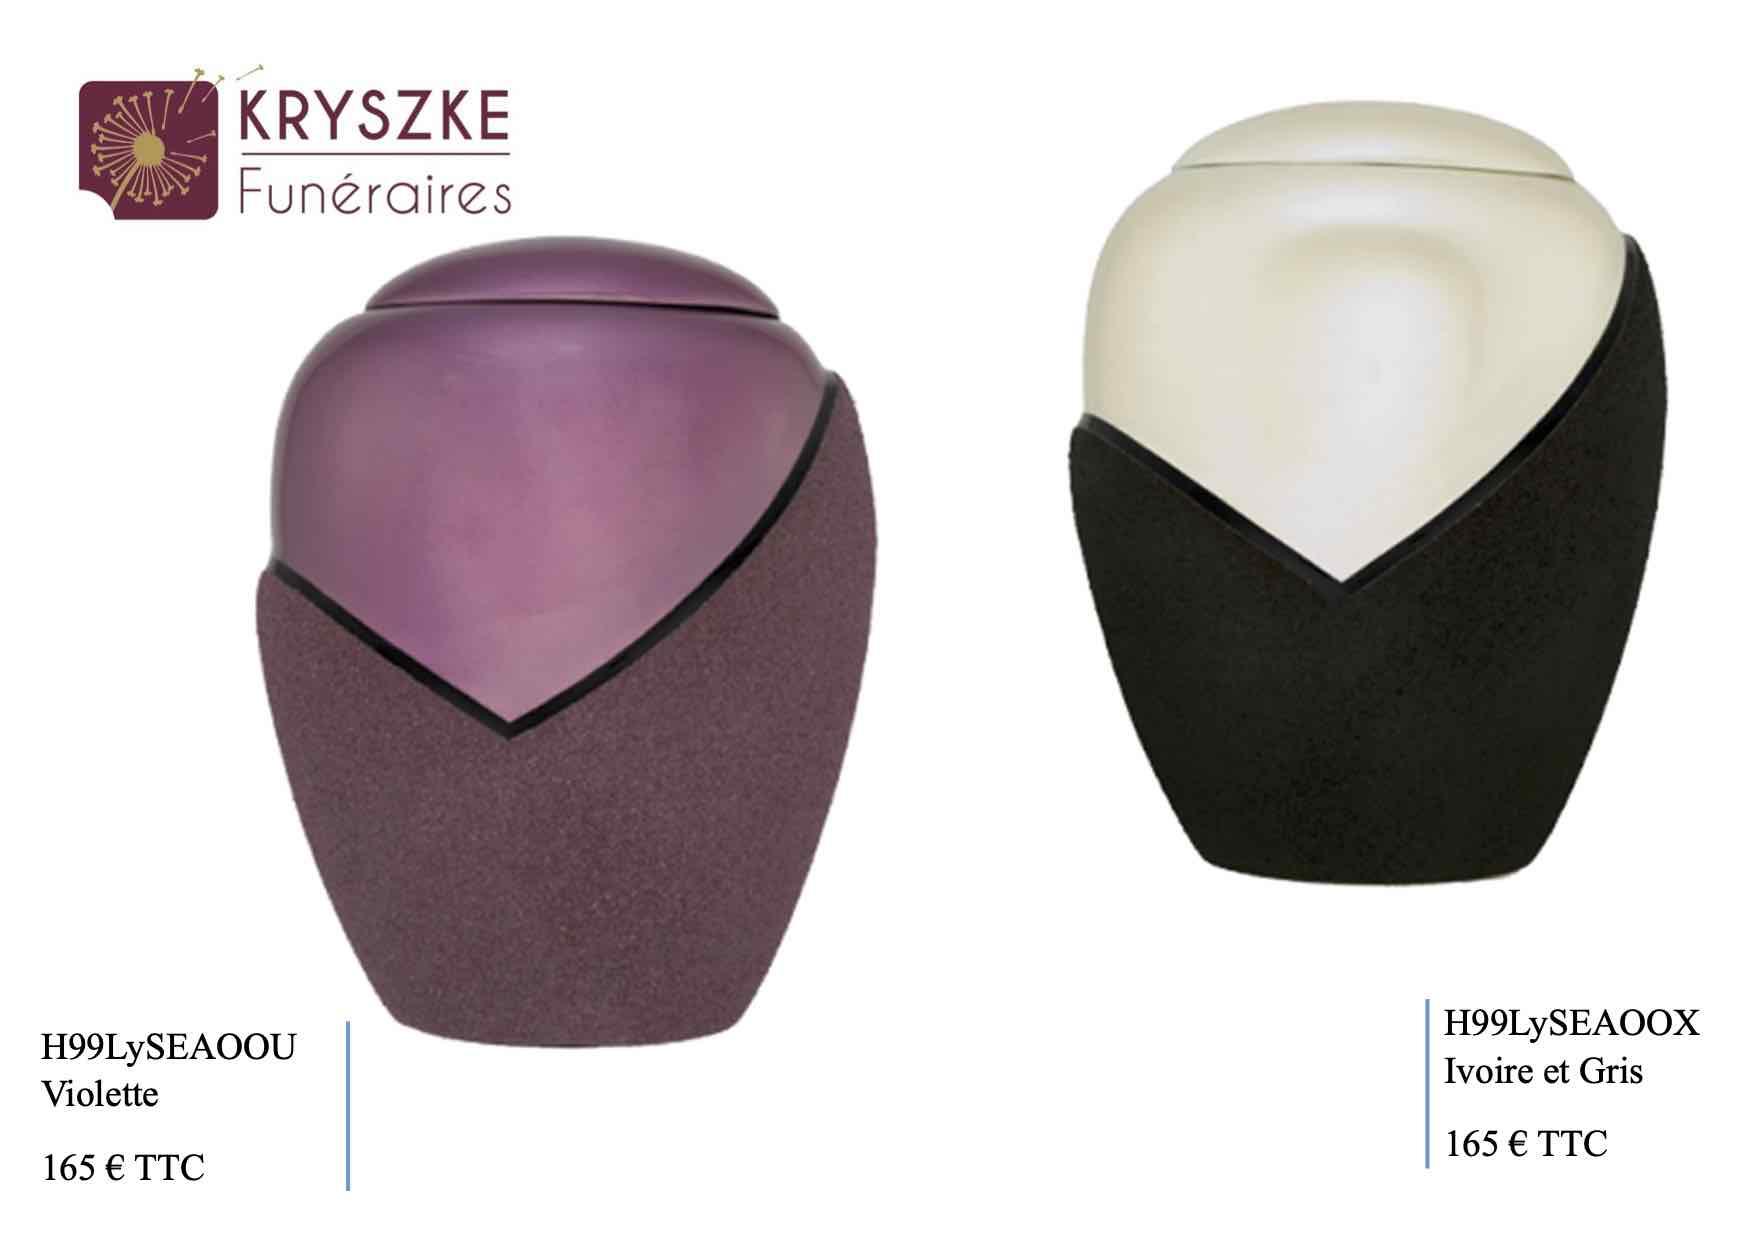 Urne violette / ivoire et gris